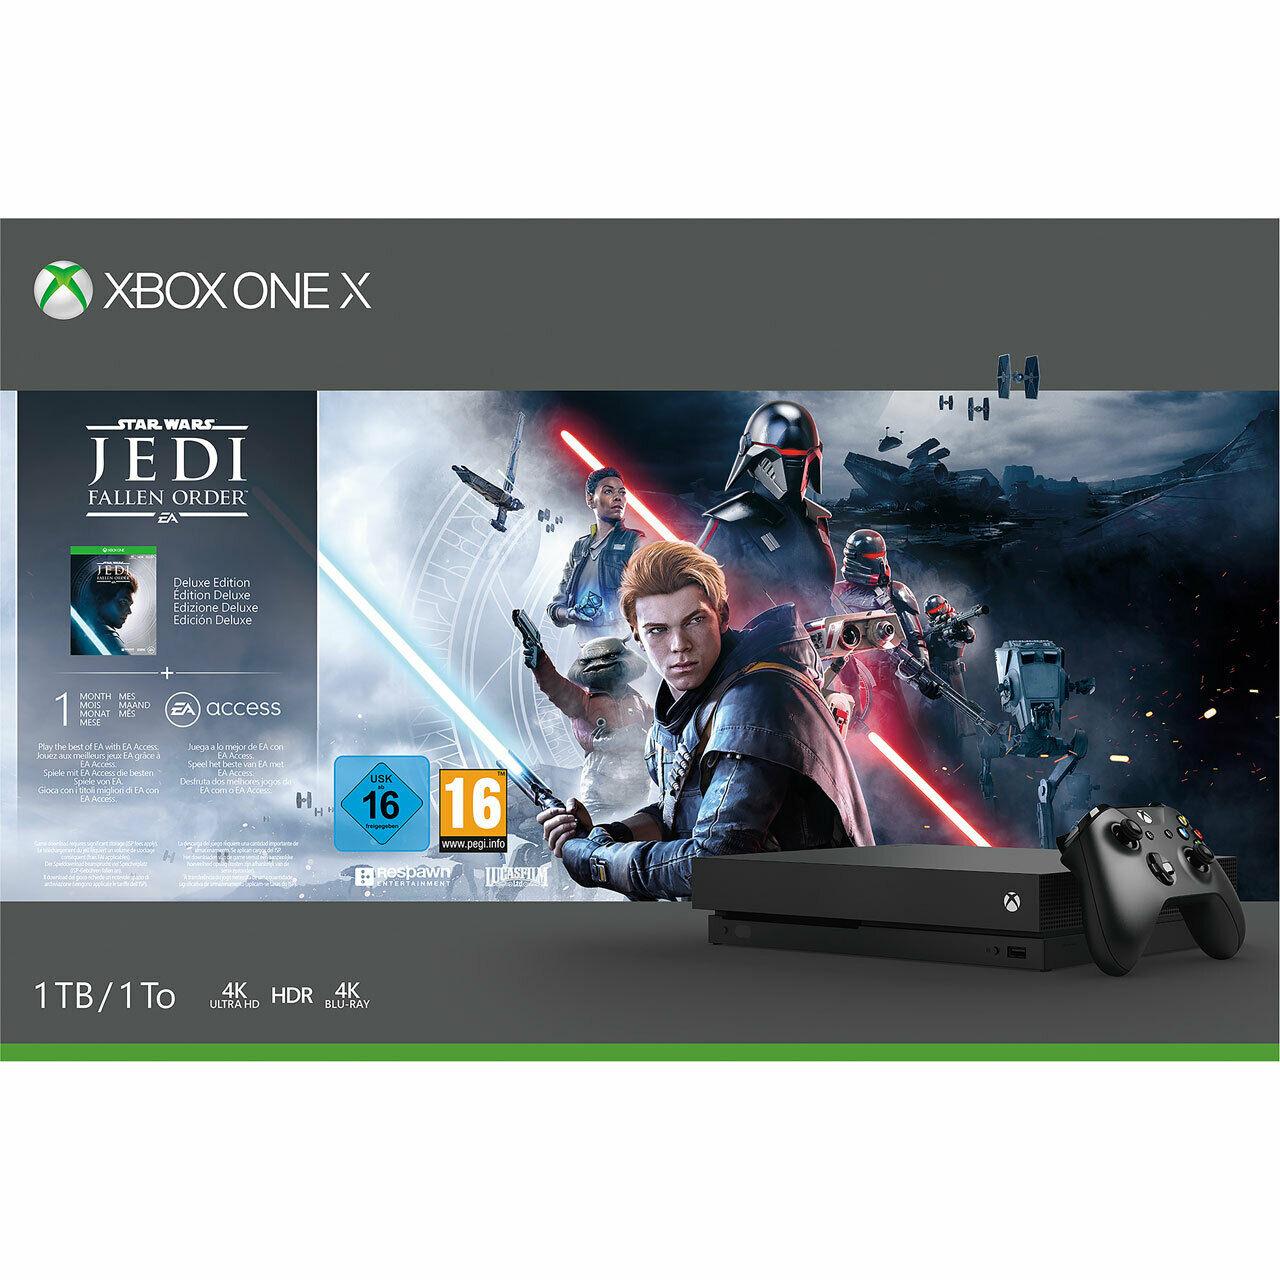 Xbox One X 1TB Console & Star Wars Jedi: Fallen Order Bundle - £265.05 Delivered @ Currys / eBay